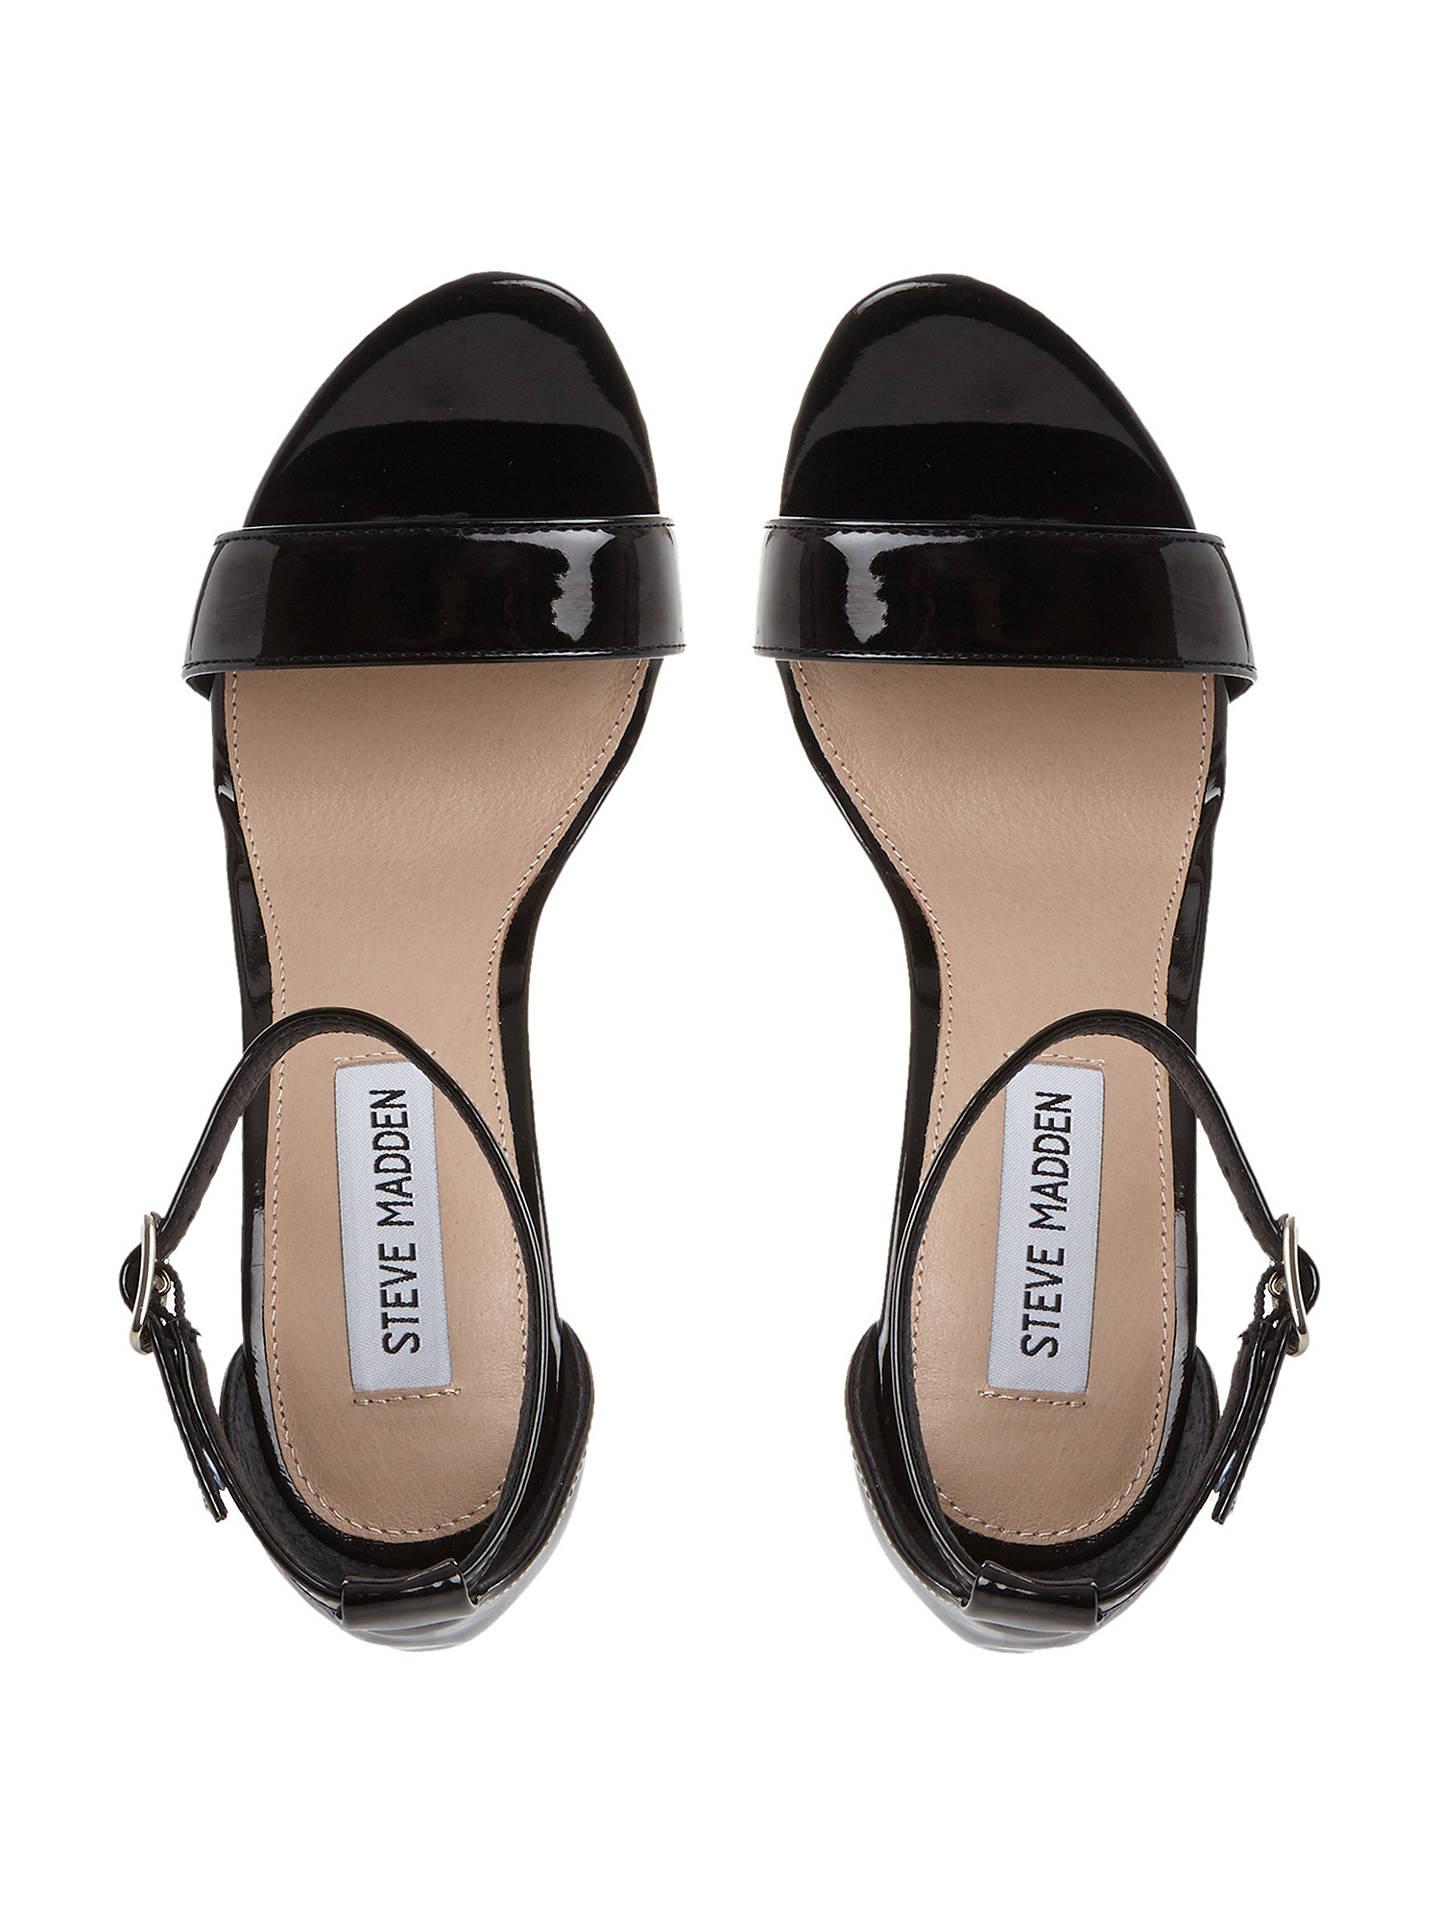 34c160669026 ... Buy Steve Madden Carrson High Block Heel Two Part Sandals